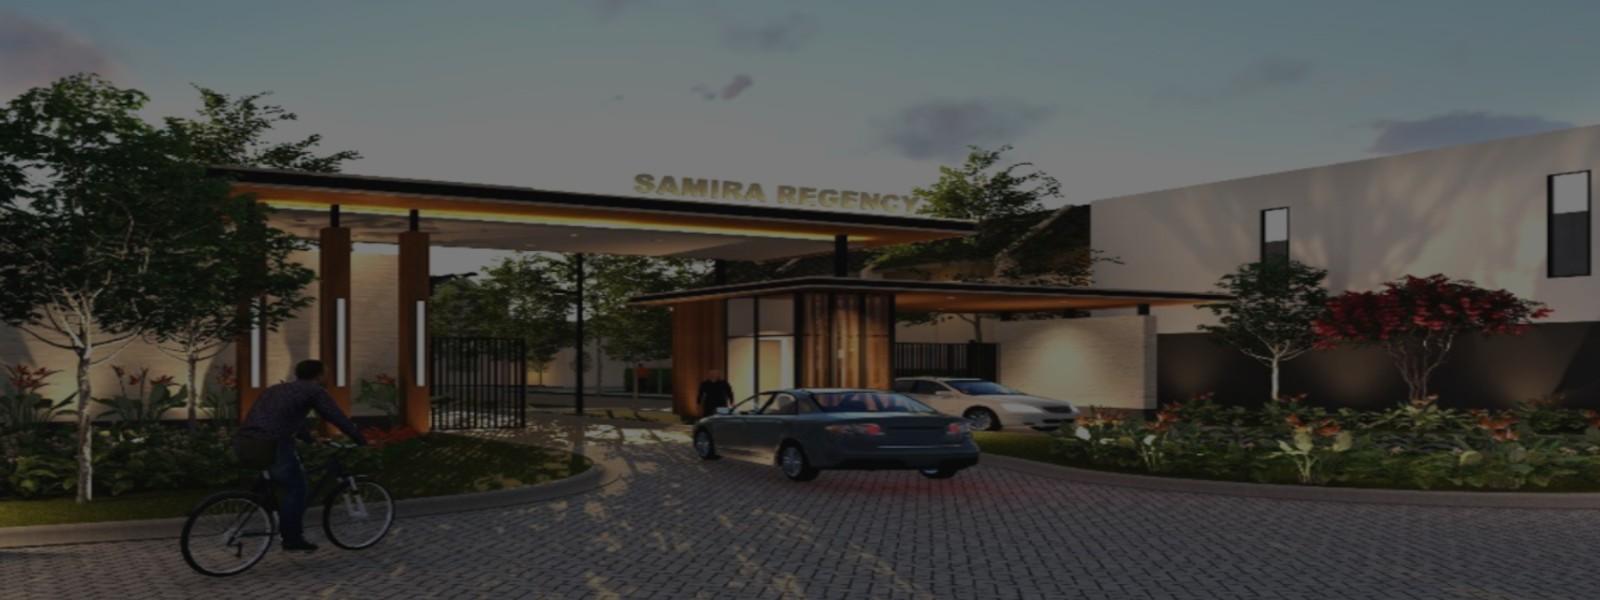 Samira Regency Bekasi Banner Dekstop